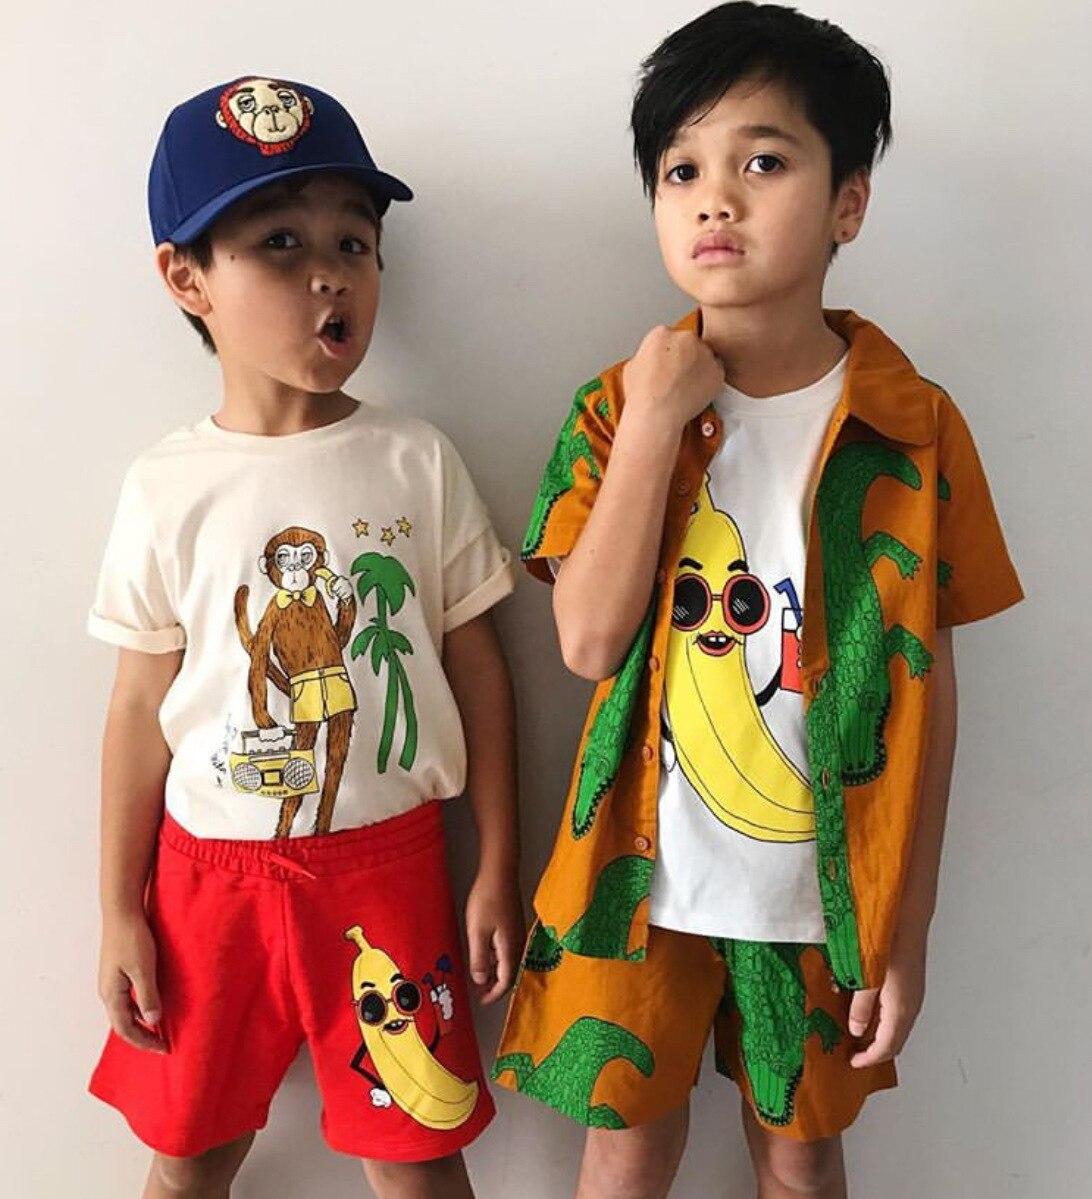 2021 New Summer Mini Kids T-shirts Baby Girls Clothes Cartoon Short Sleeve Toddler Christmas Shirt Striped Shirt Boys Tops Tees 4